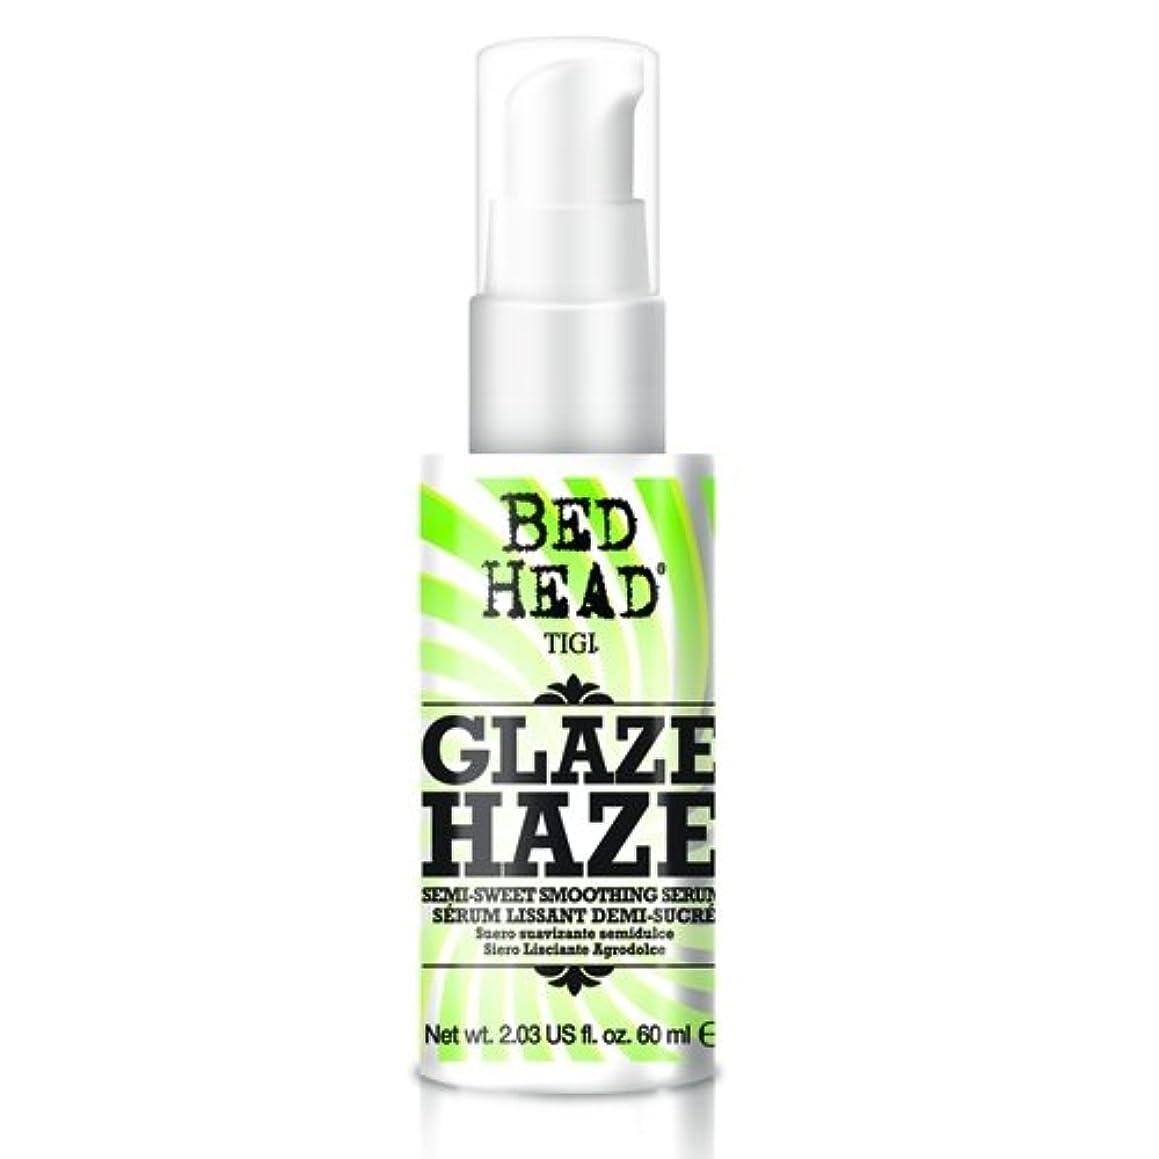 TIGI Bed Head: Candy Fixations Glaze Haze, 2.03 oz